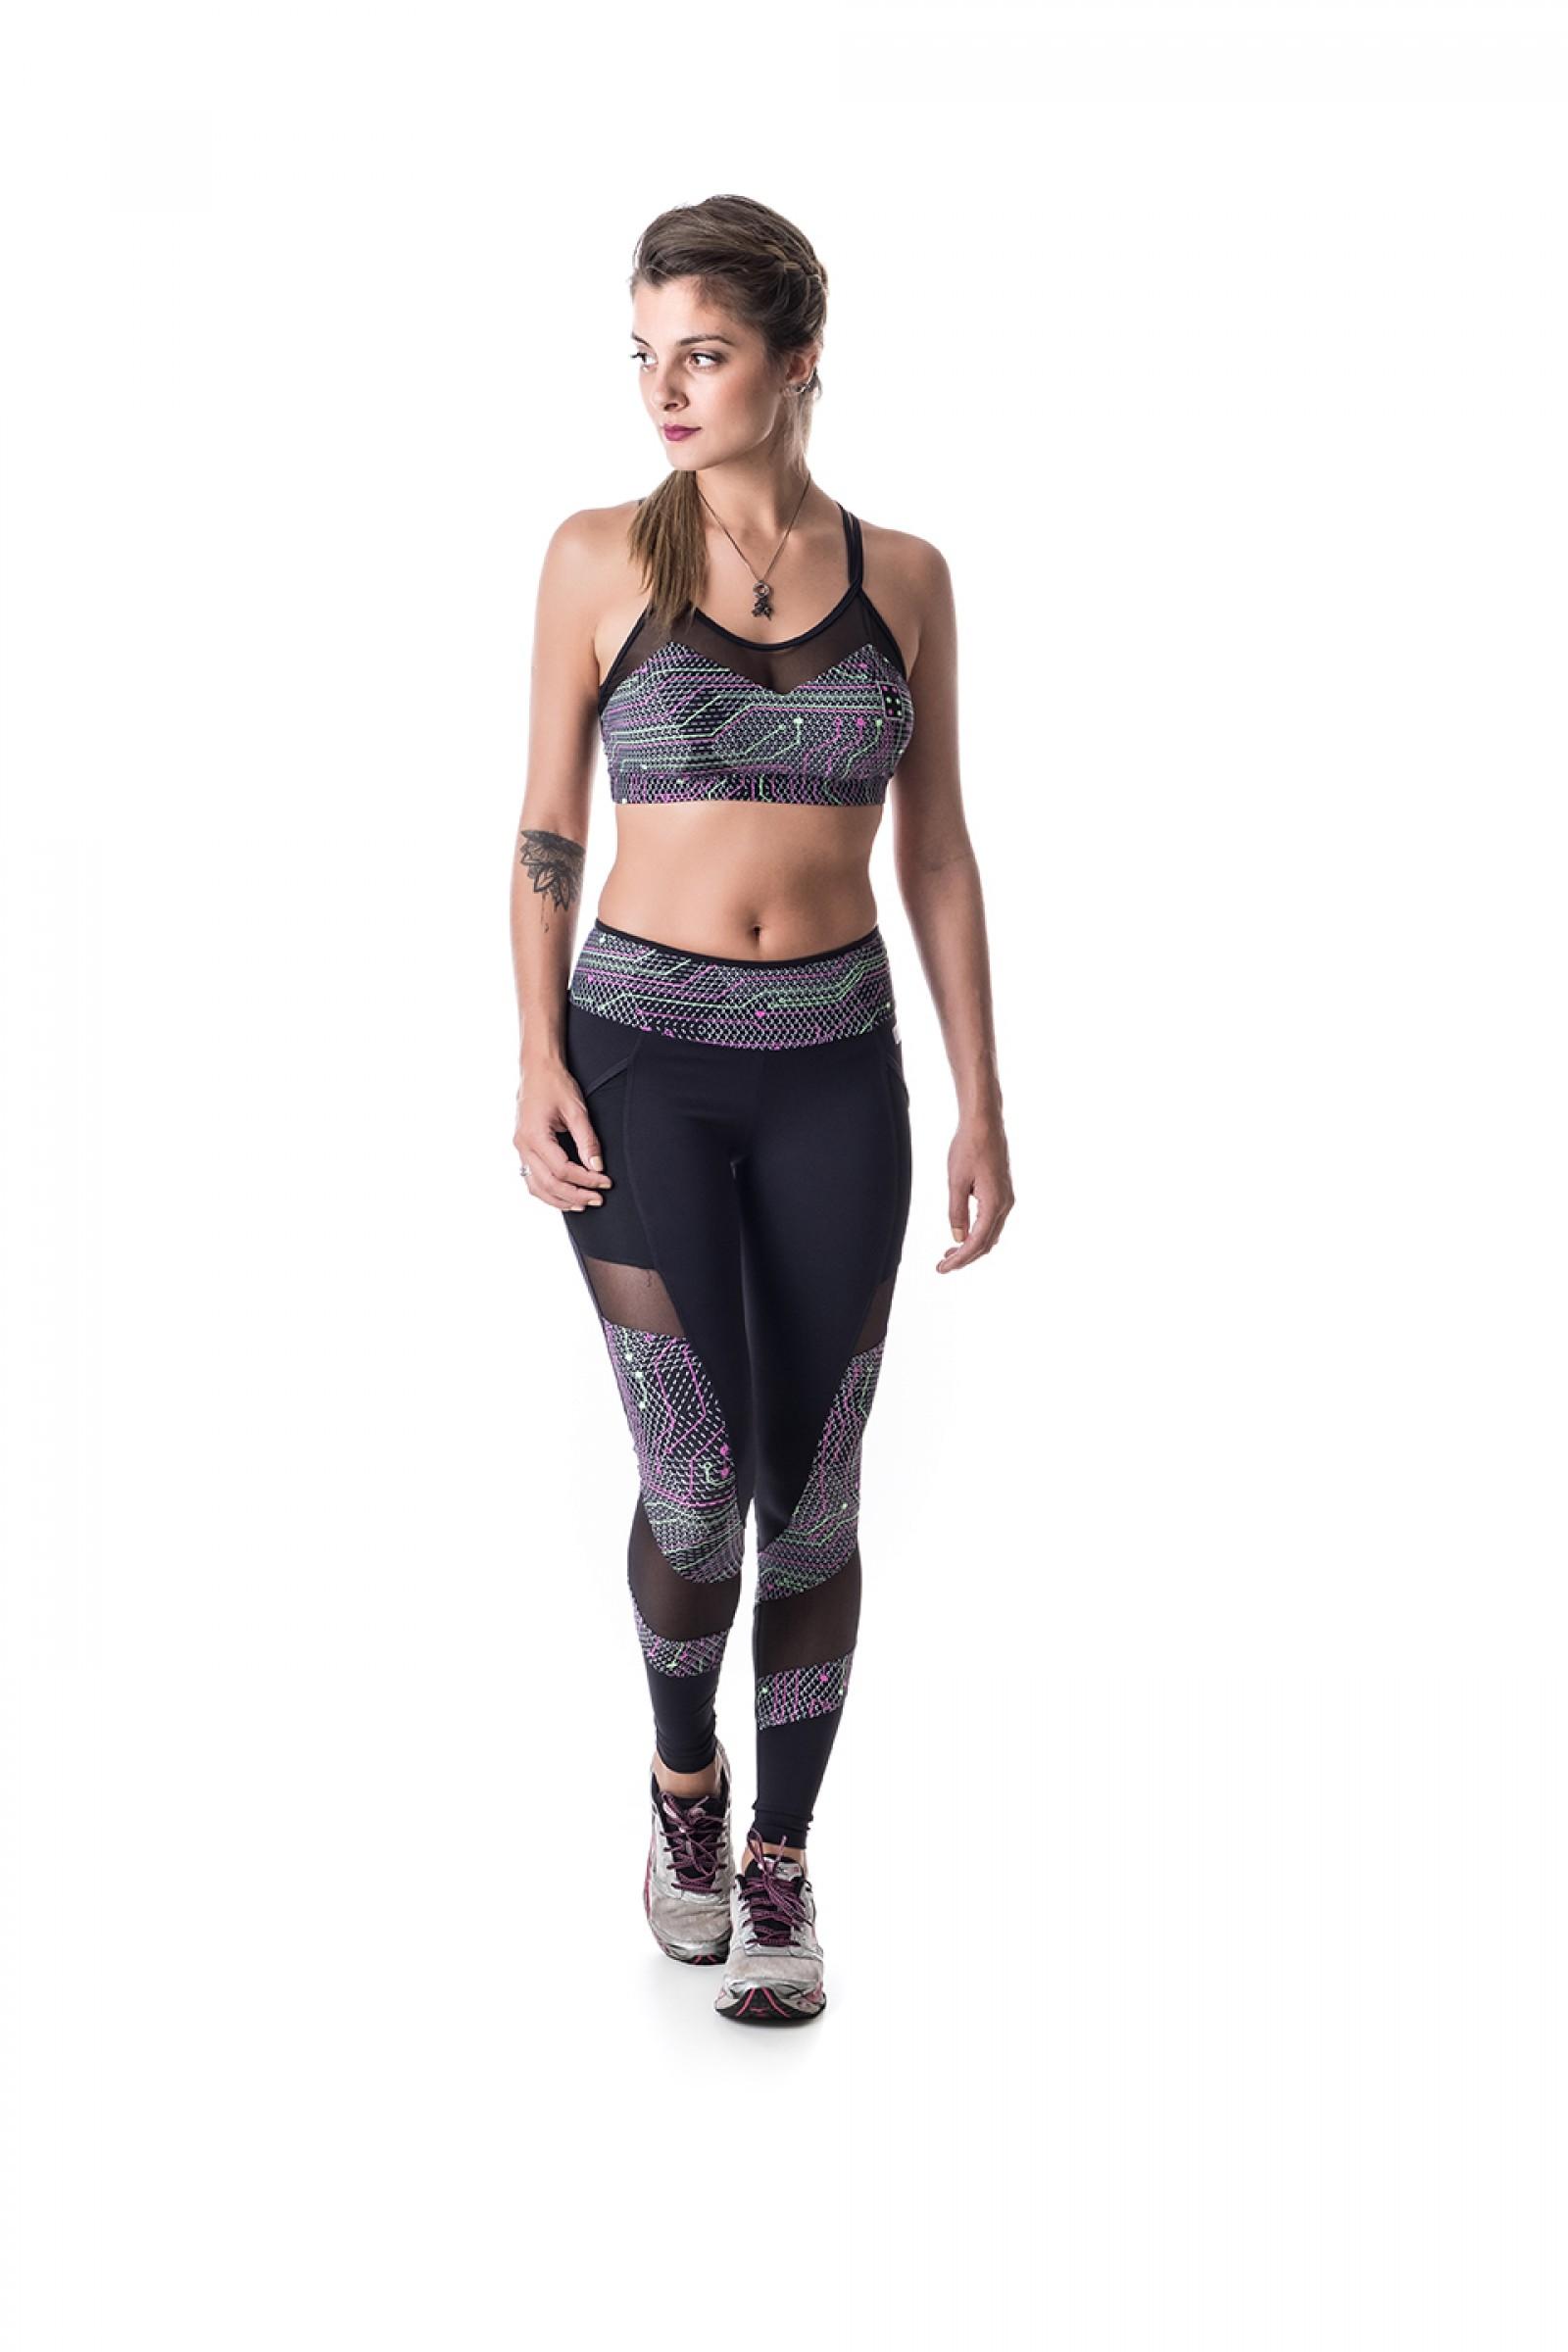 Top Best Reflet, Coleção Challenge - NKT Fitwear Moda Fitness